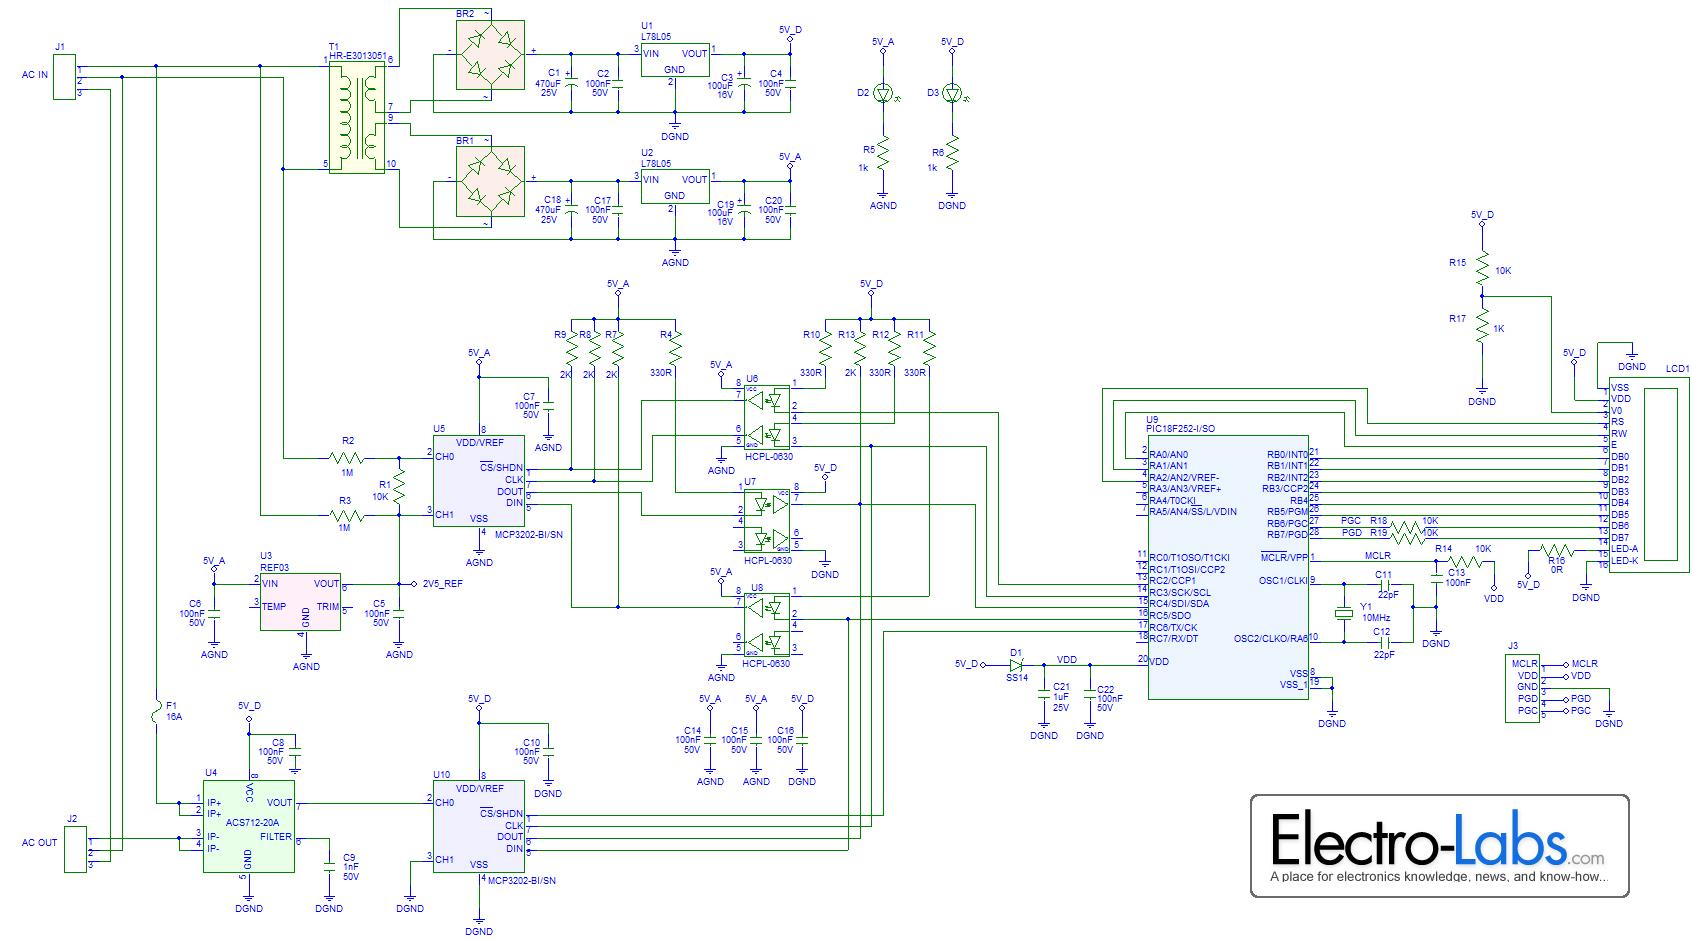 Schemi Elettrici Open Source : Wattmetro digitale ac fai da te elettronica open source